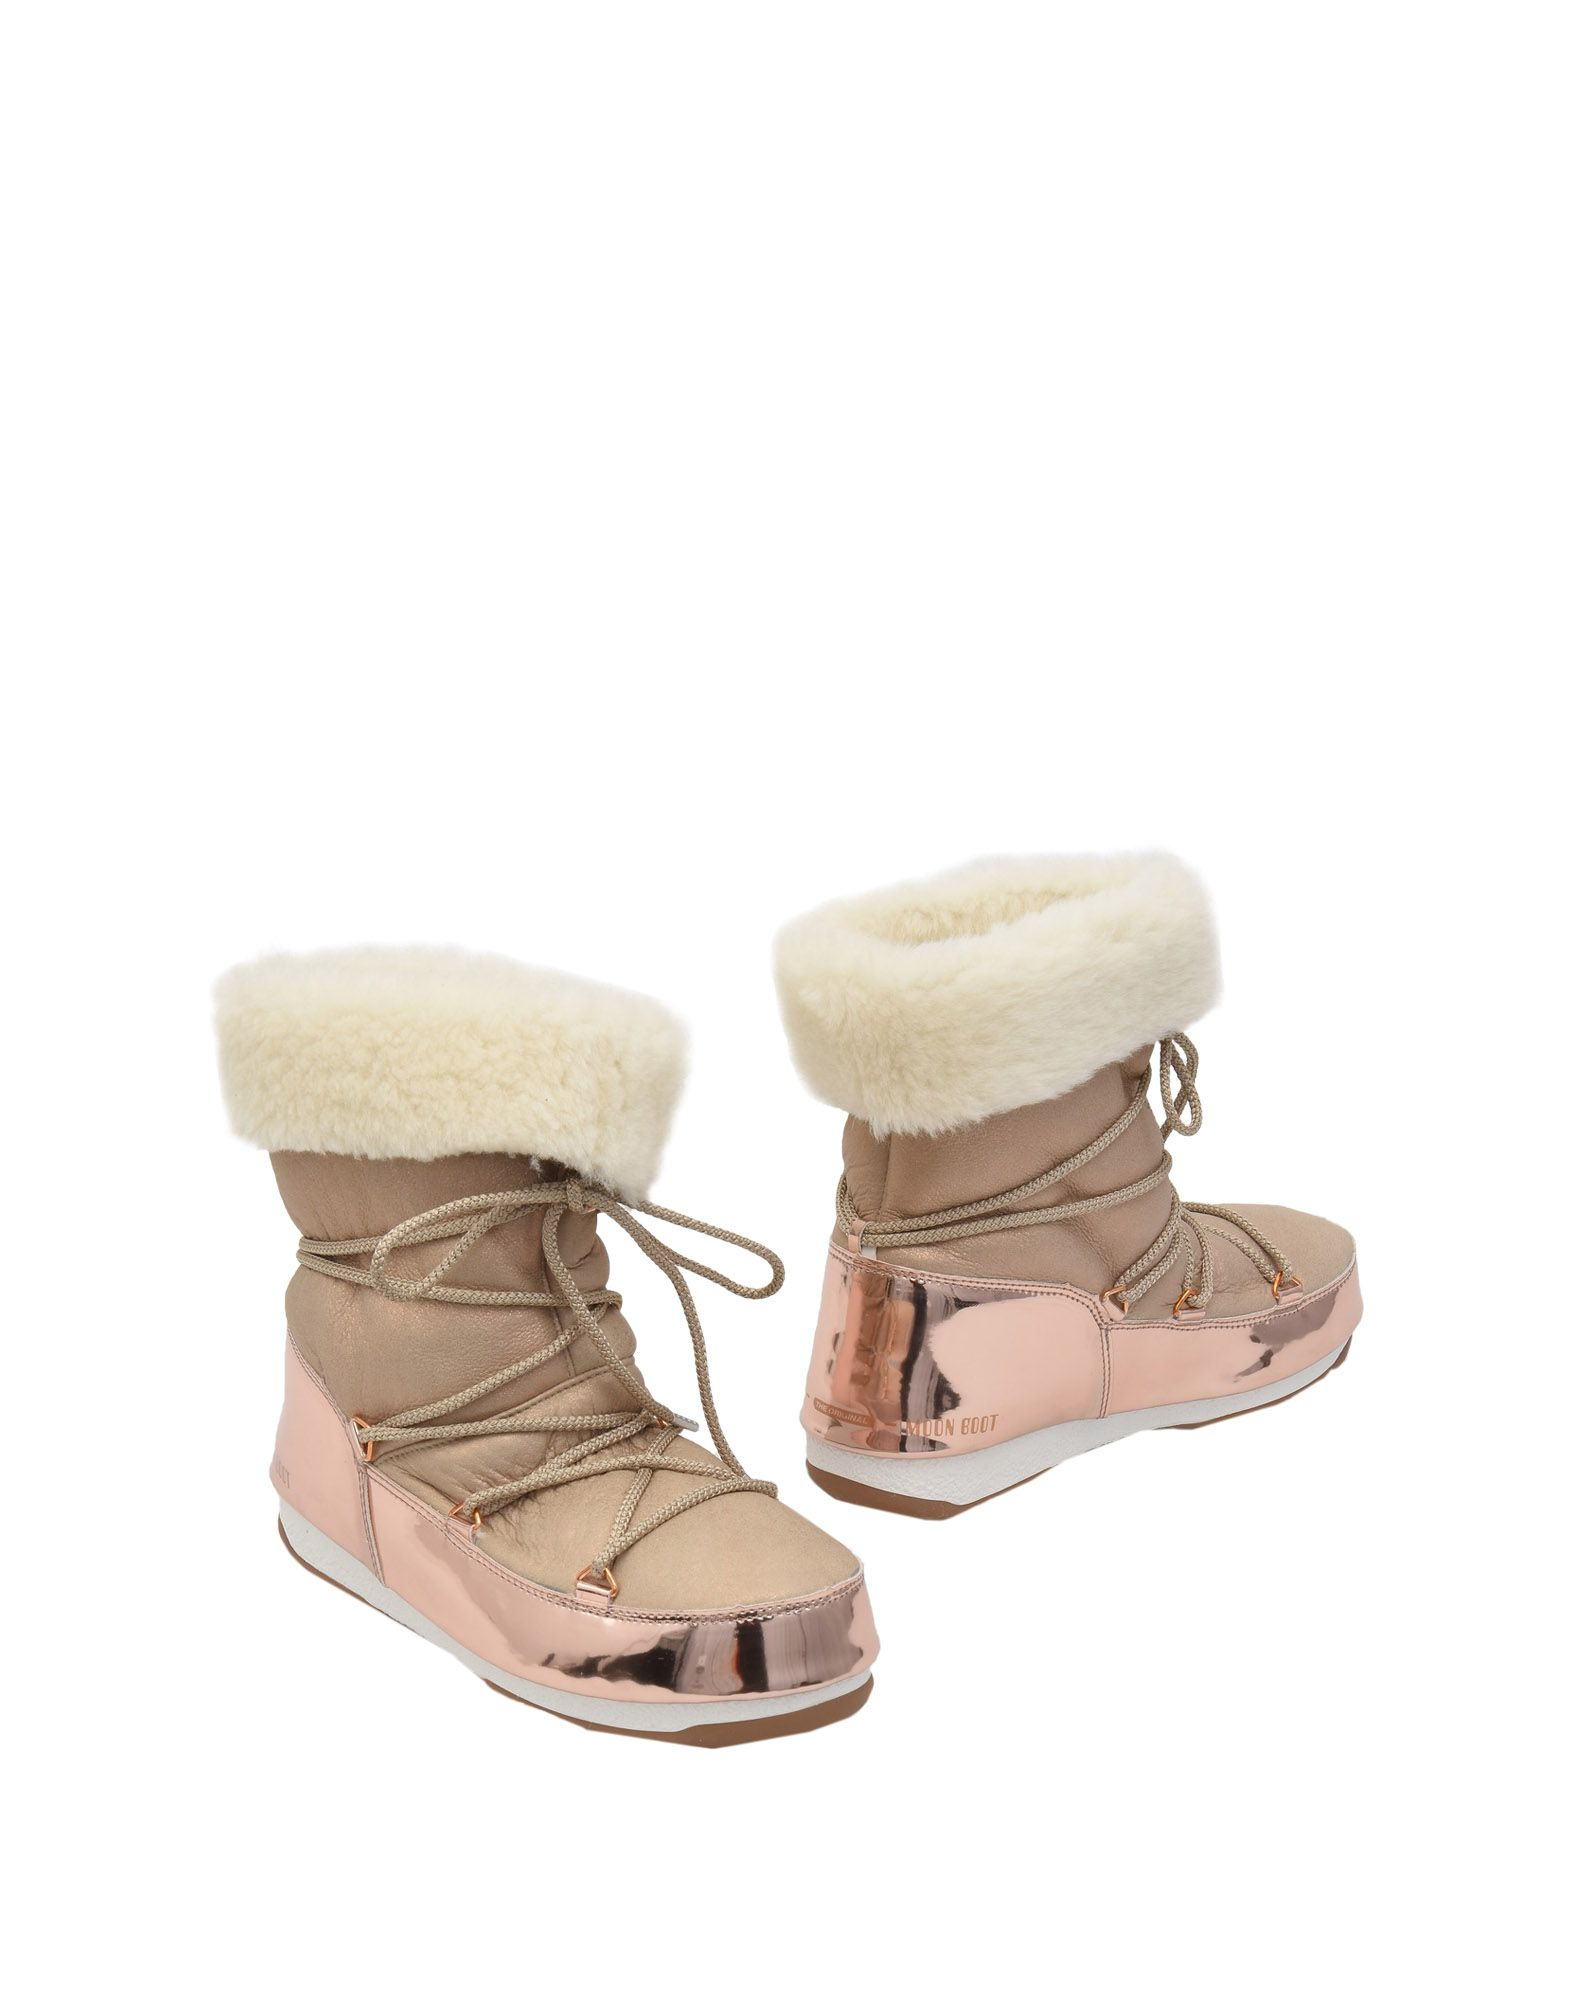 Bottine Moon Boot Moon Boot We Rose Mirror - Femme - Bottines Moon Boot sur